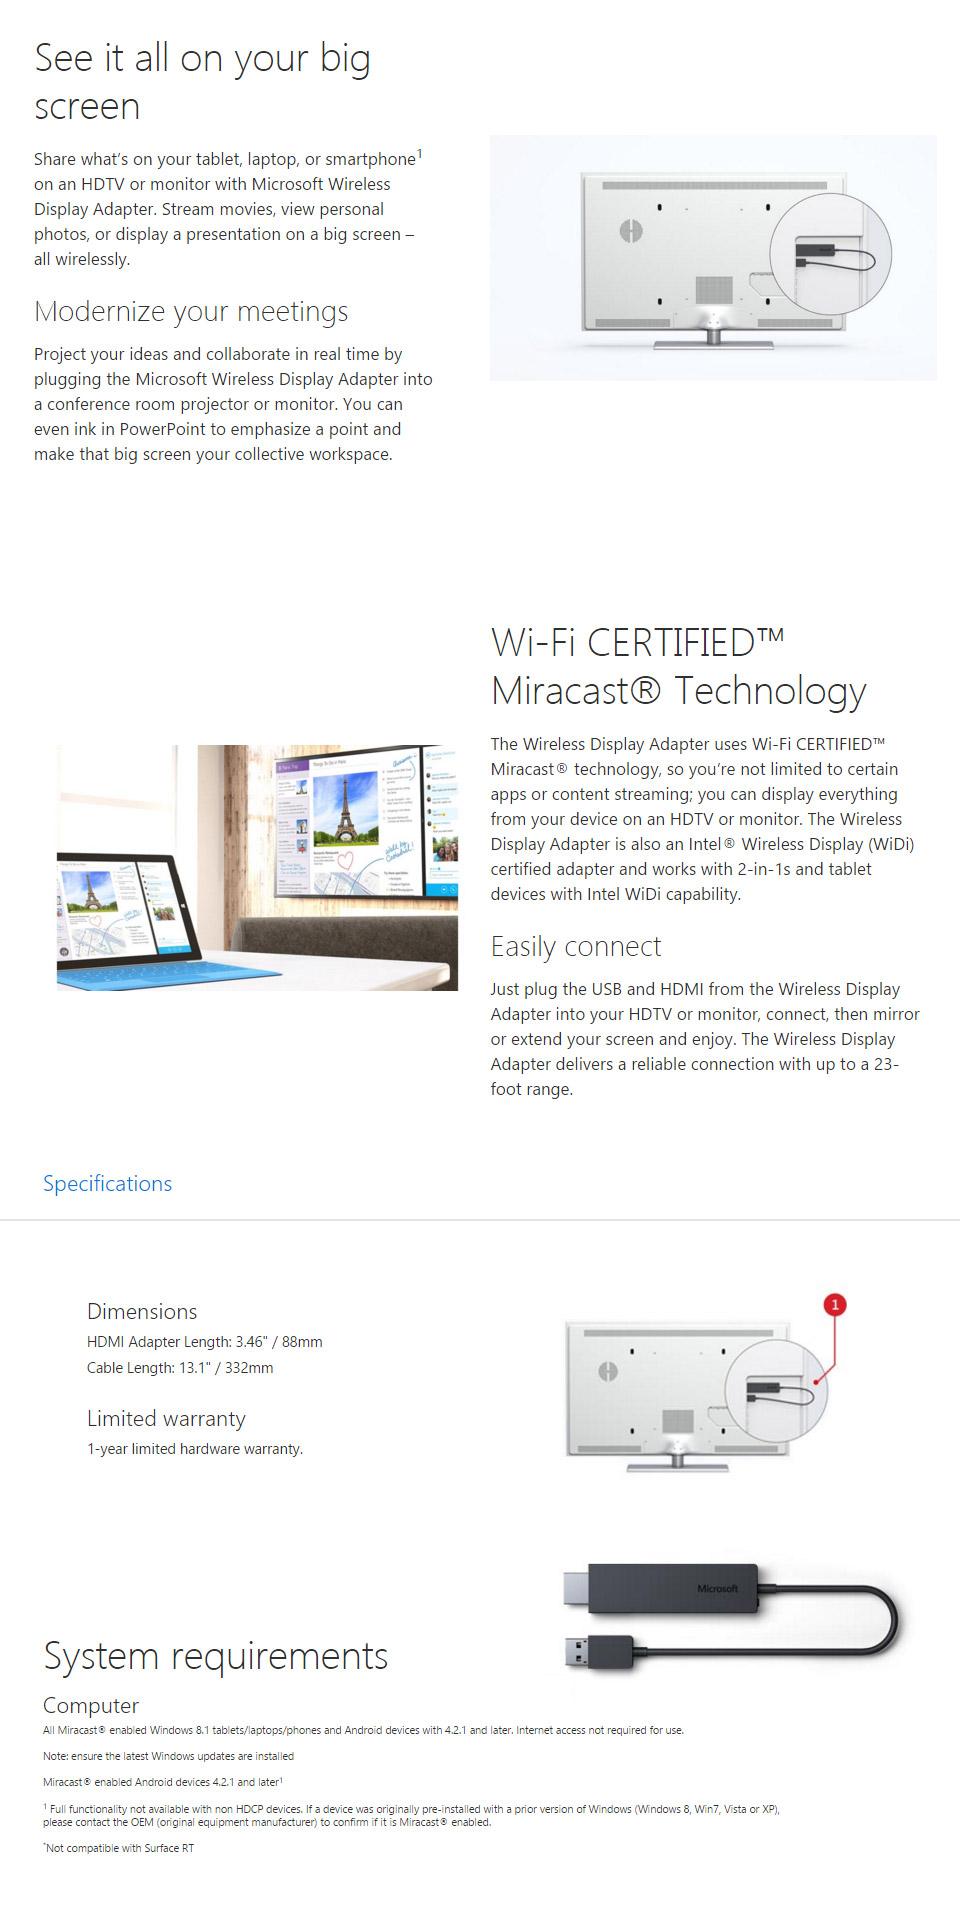 Microsoft Wireless Display Adapter V1 [CG4-00016(WLDSPADPT)] : PC